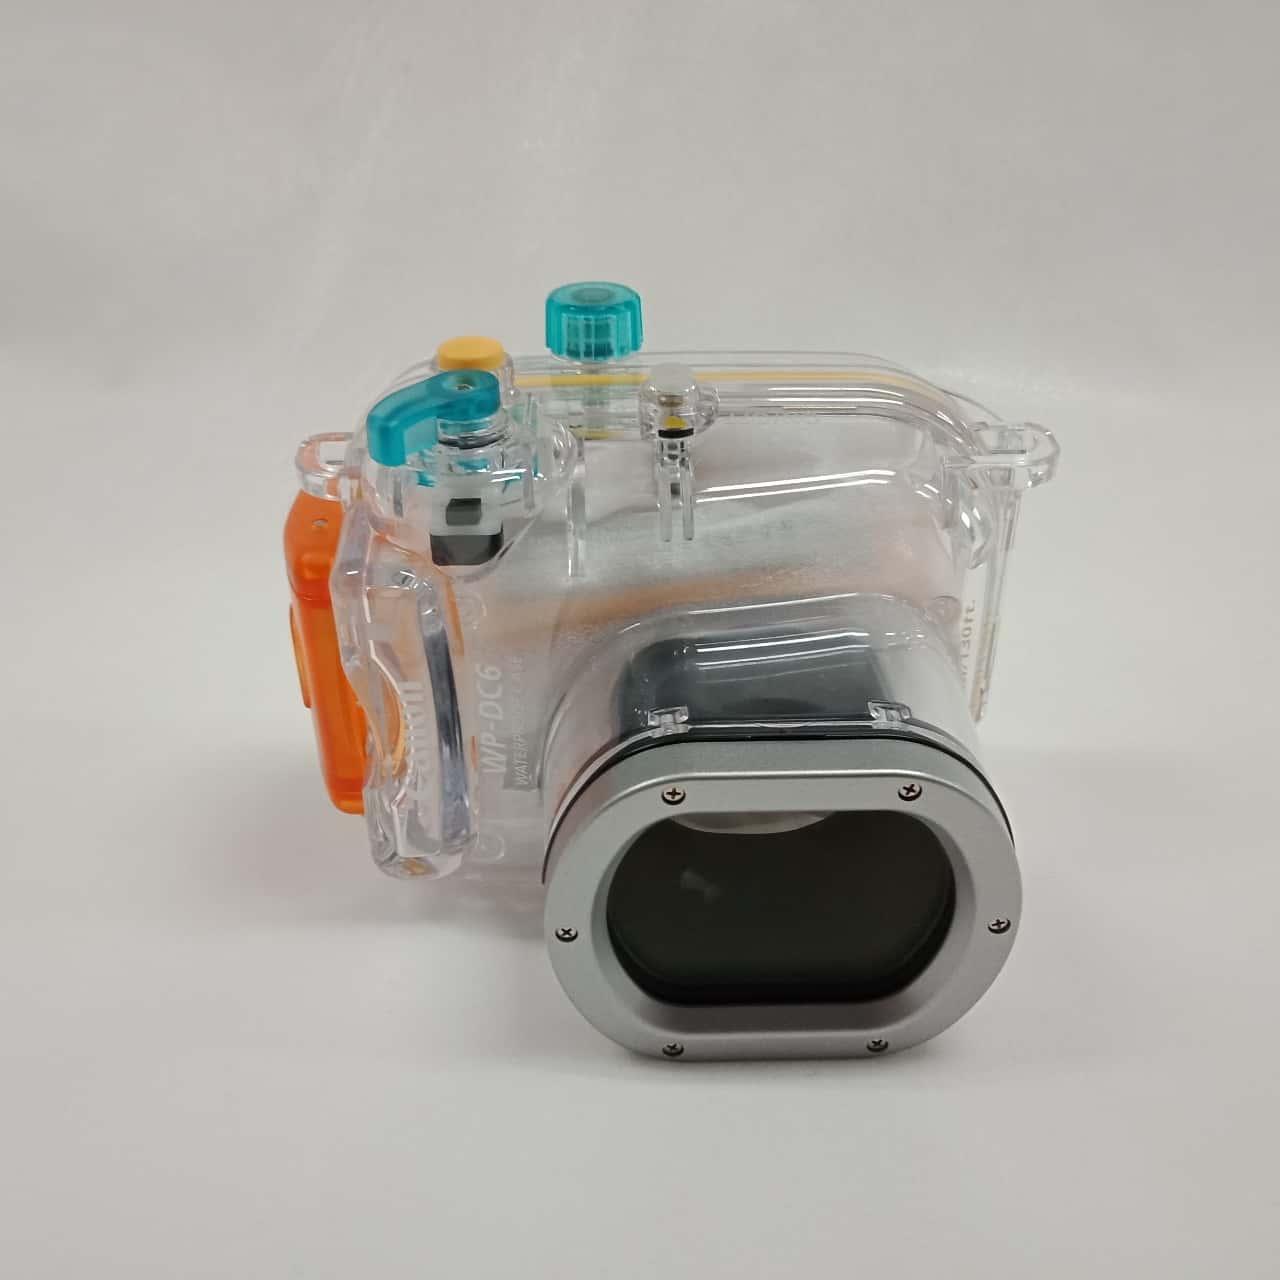 Canon WP-DC6 waterproof camera case